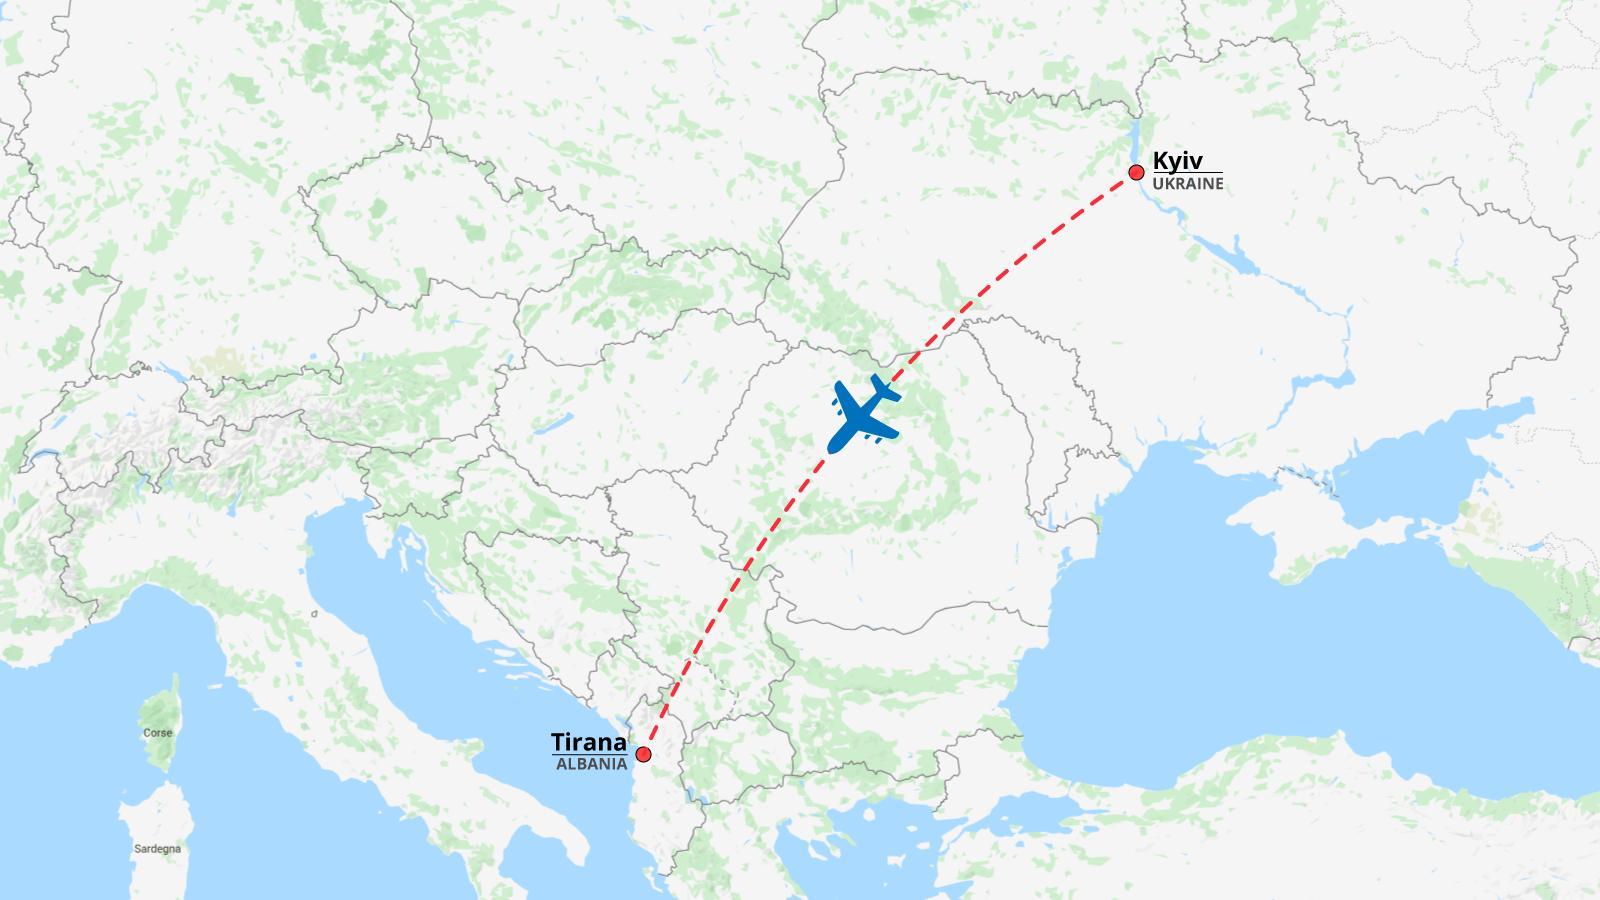 https://www.occrp.org/assets/fraud-factory/Kyiv-to-Tirana.jpg